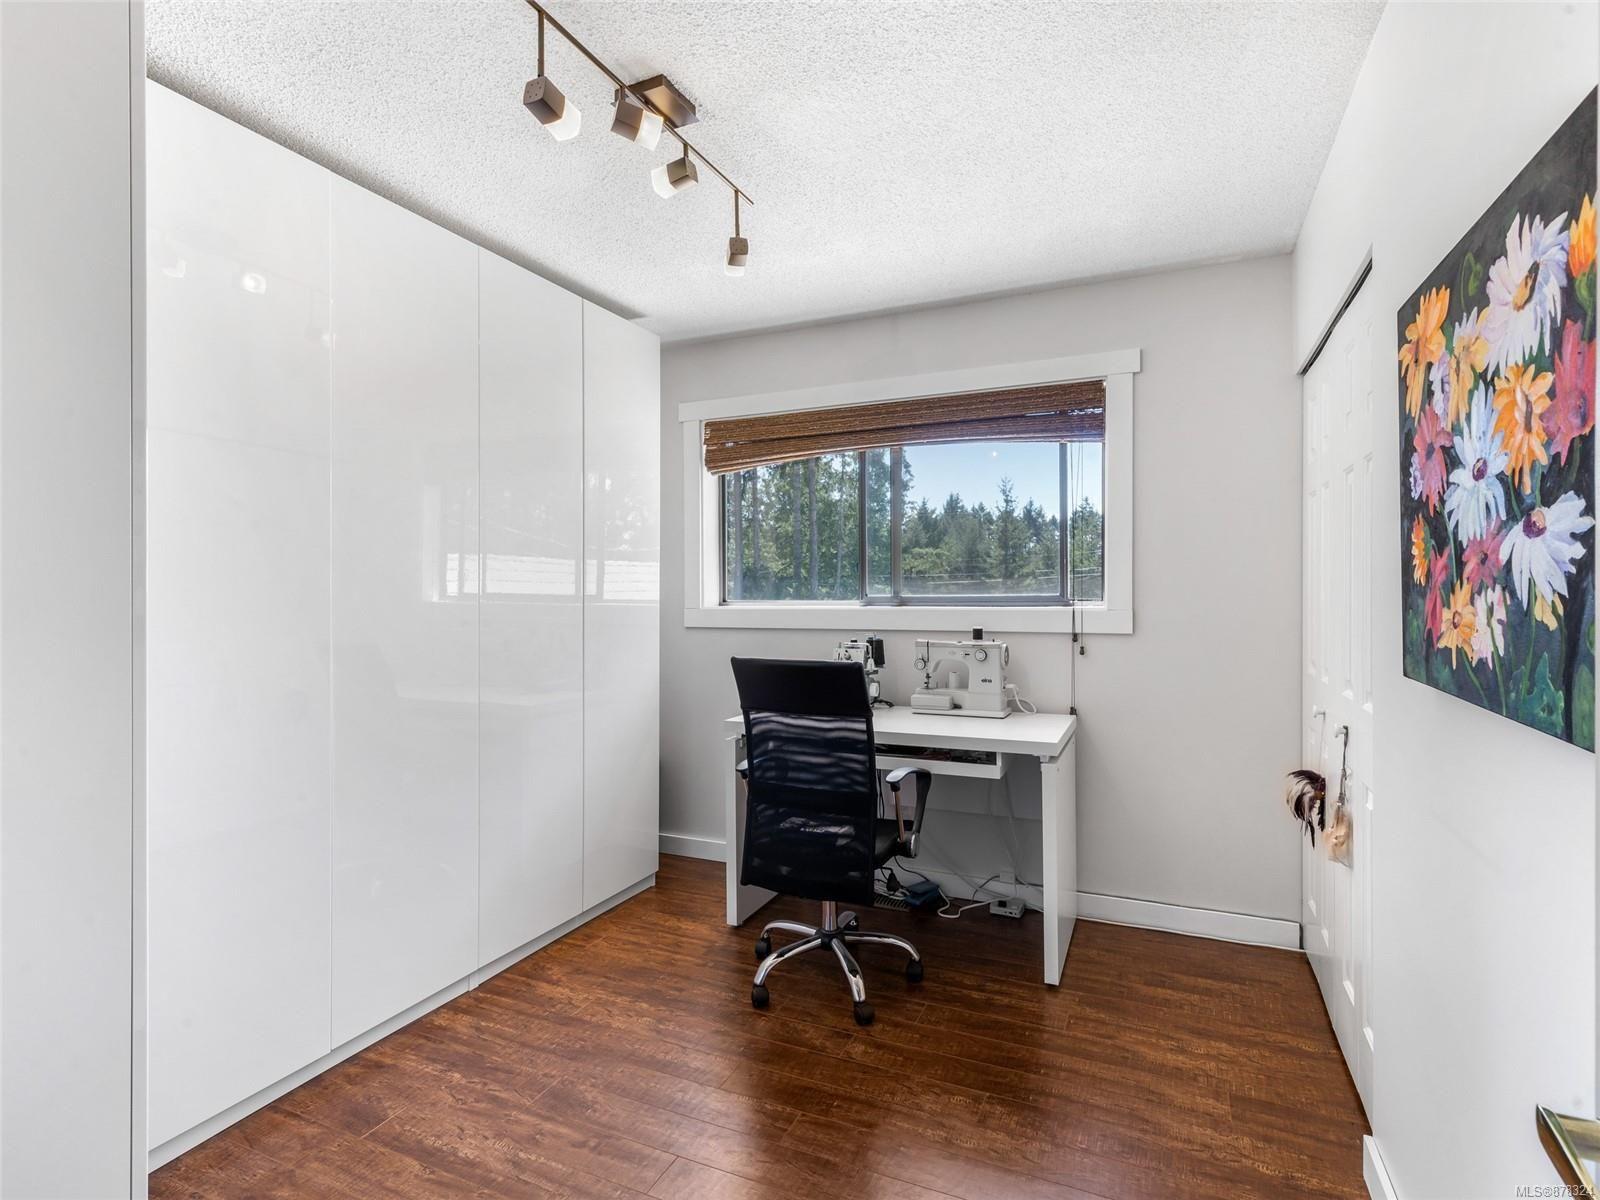 Photo 30: Photos: 3875 Moore Rd in : PA Port Alberni House for sale (Port Alberni)  : MLS®# 878324